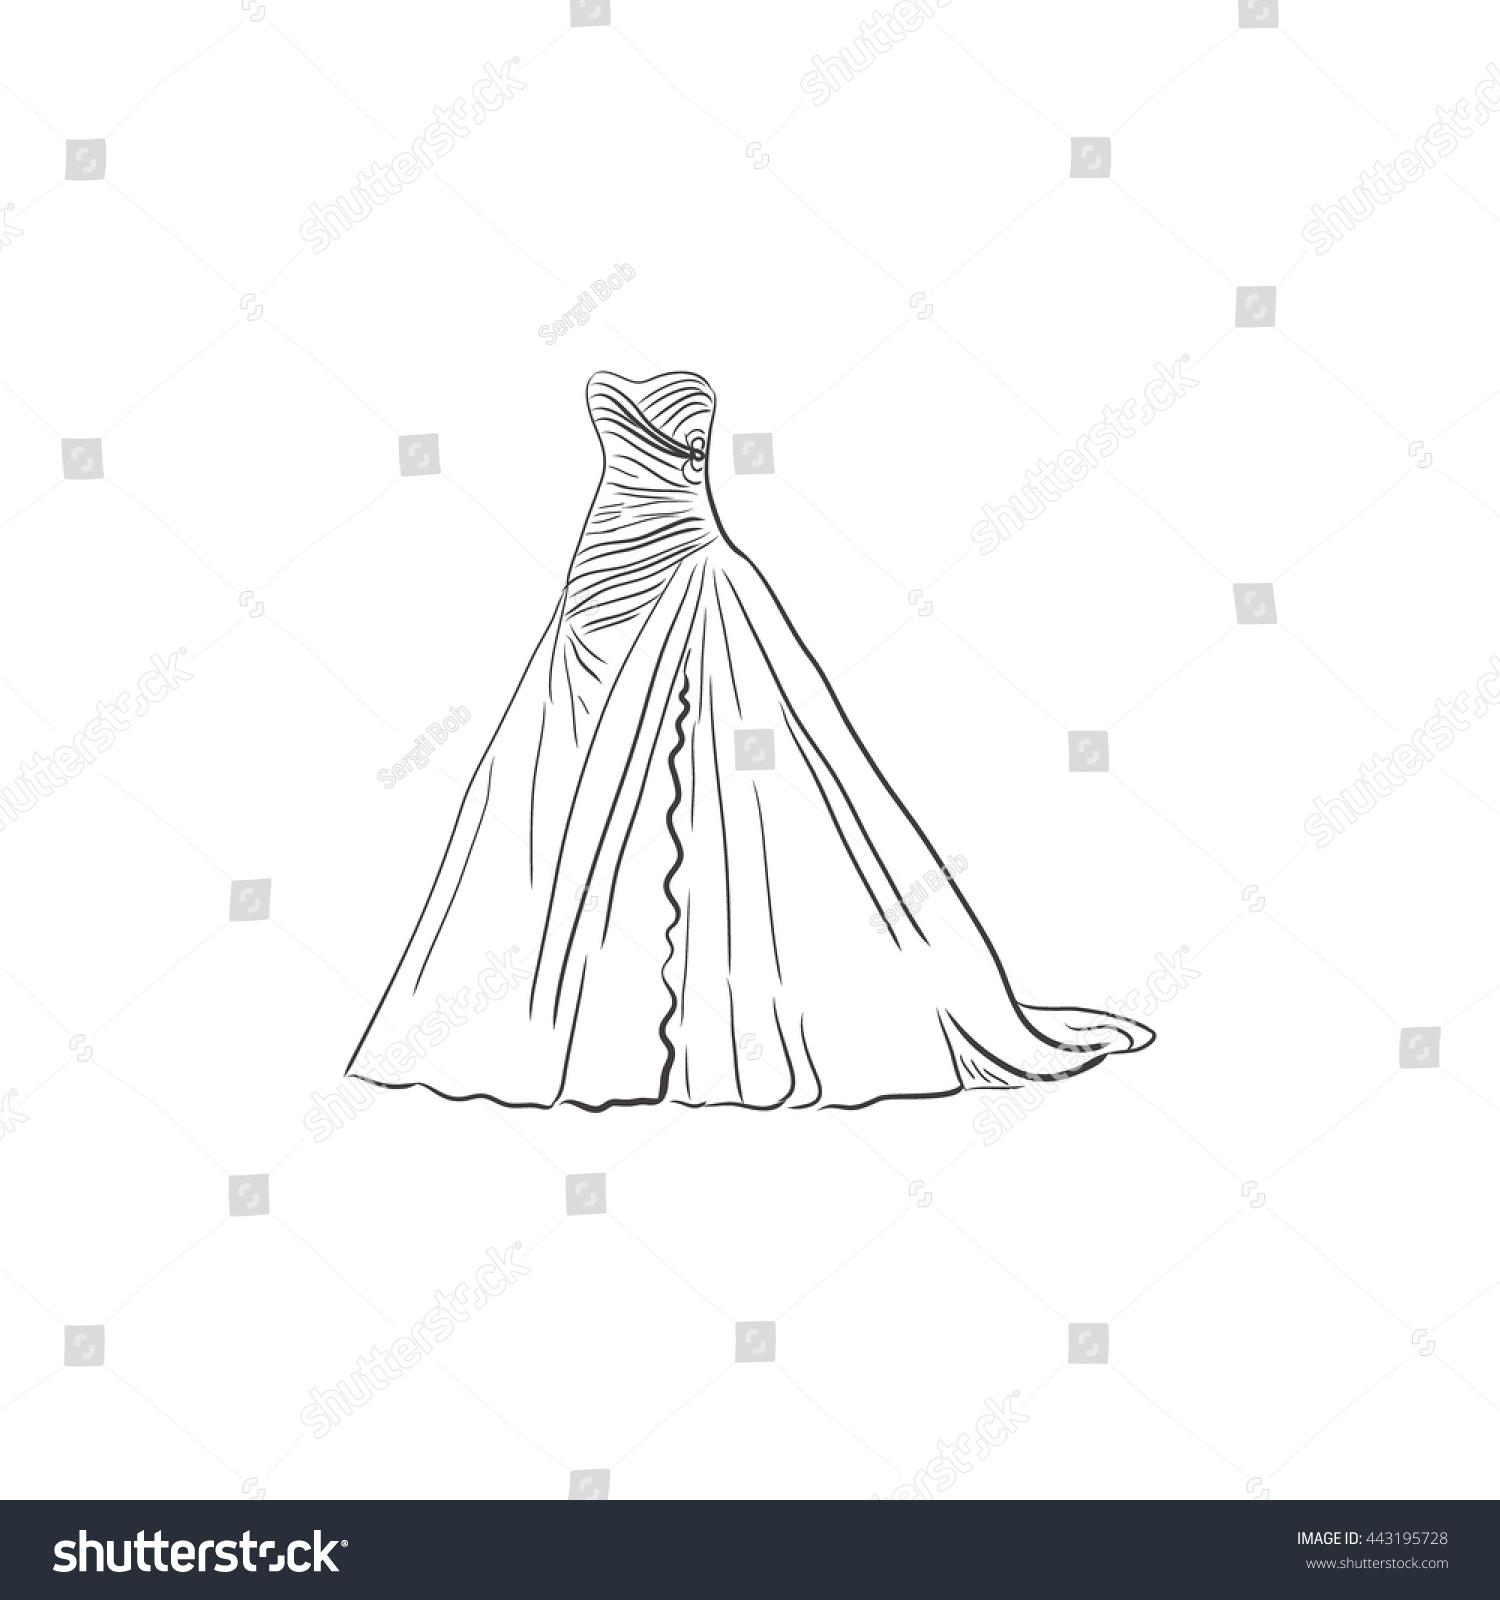 Wedding Dress Sketch Design Vector Illustration Stock Vector HD ...